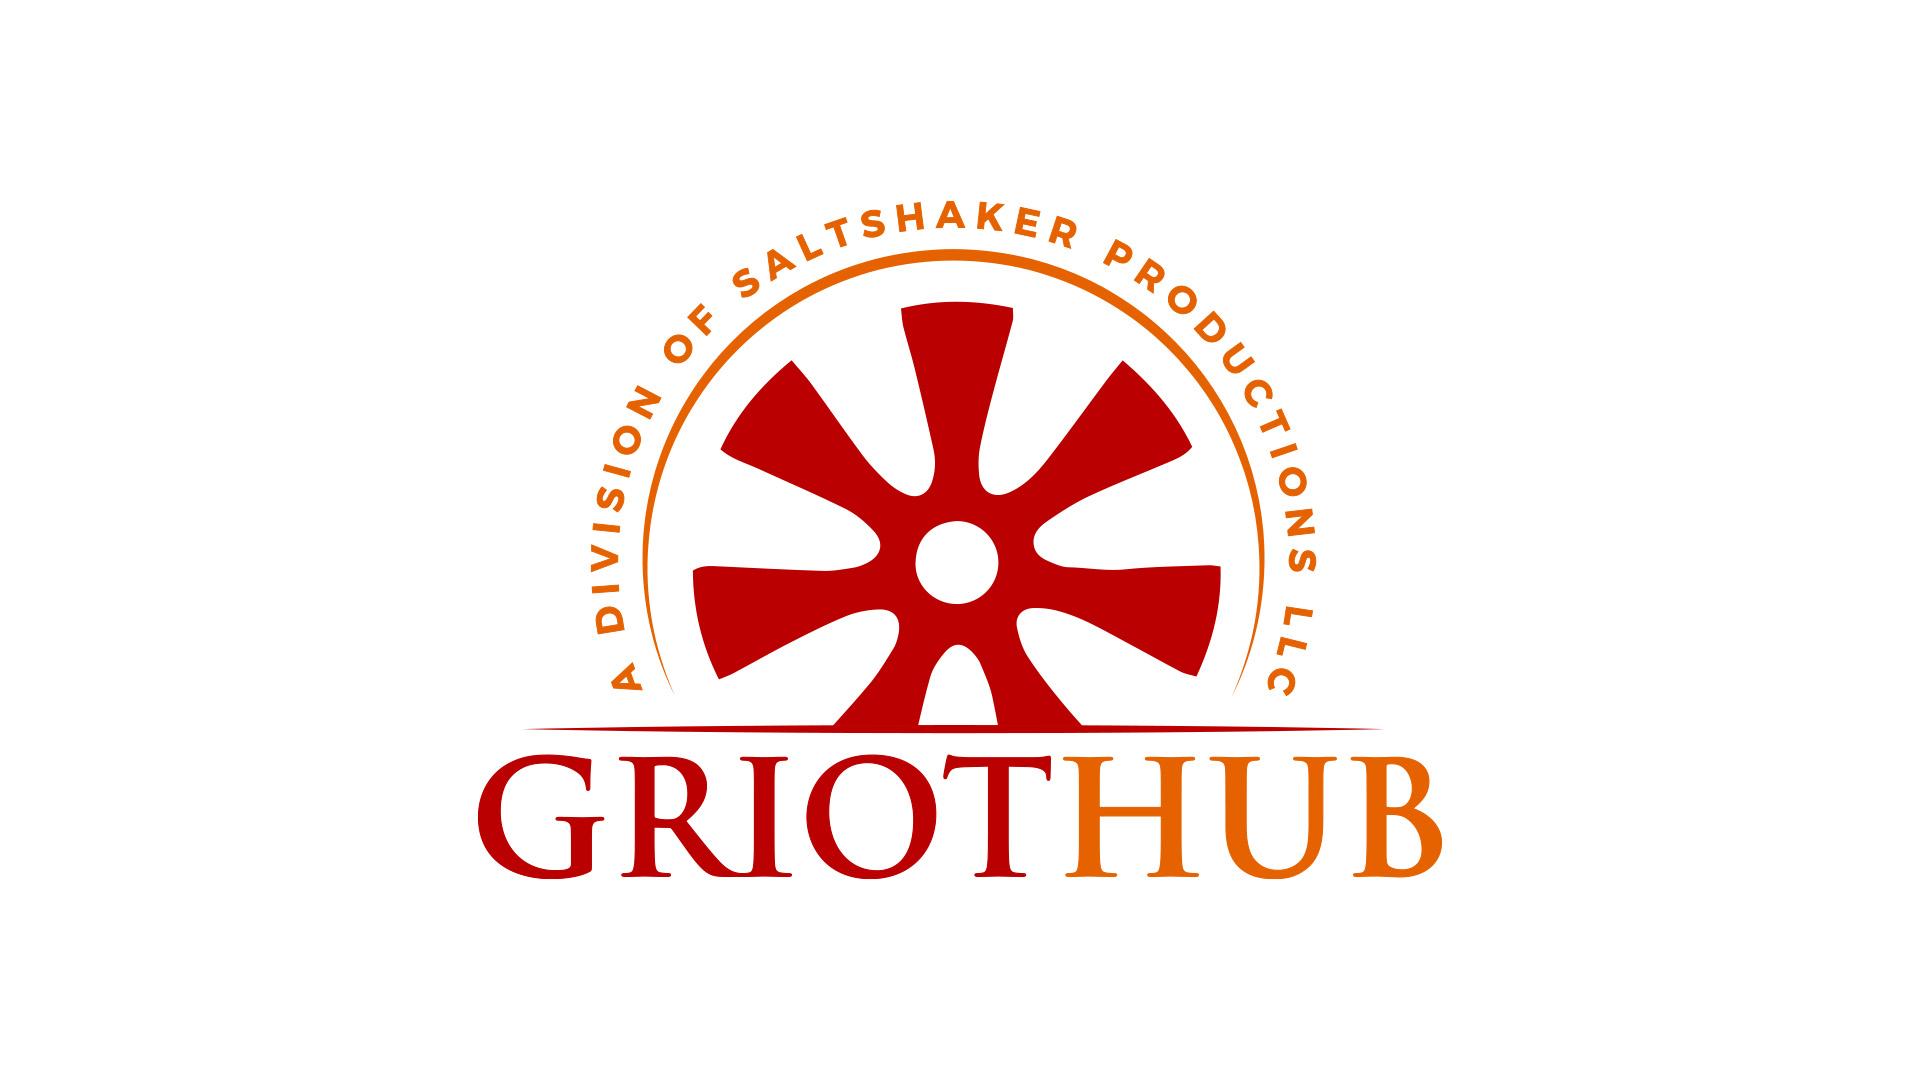 Griothub